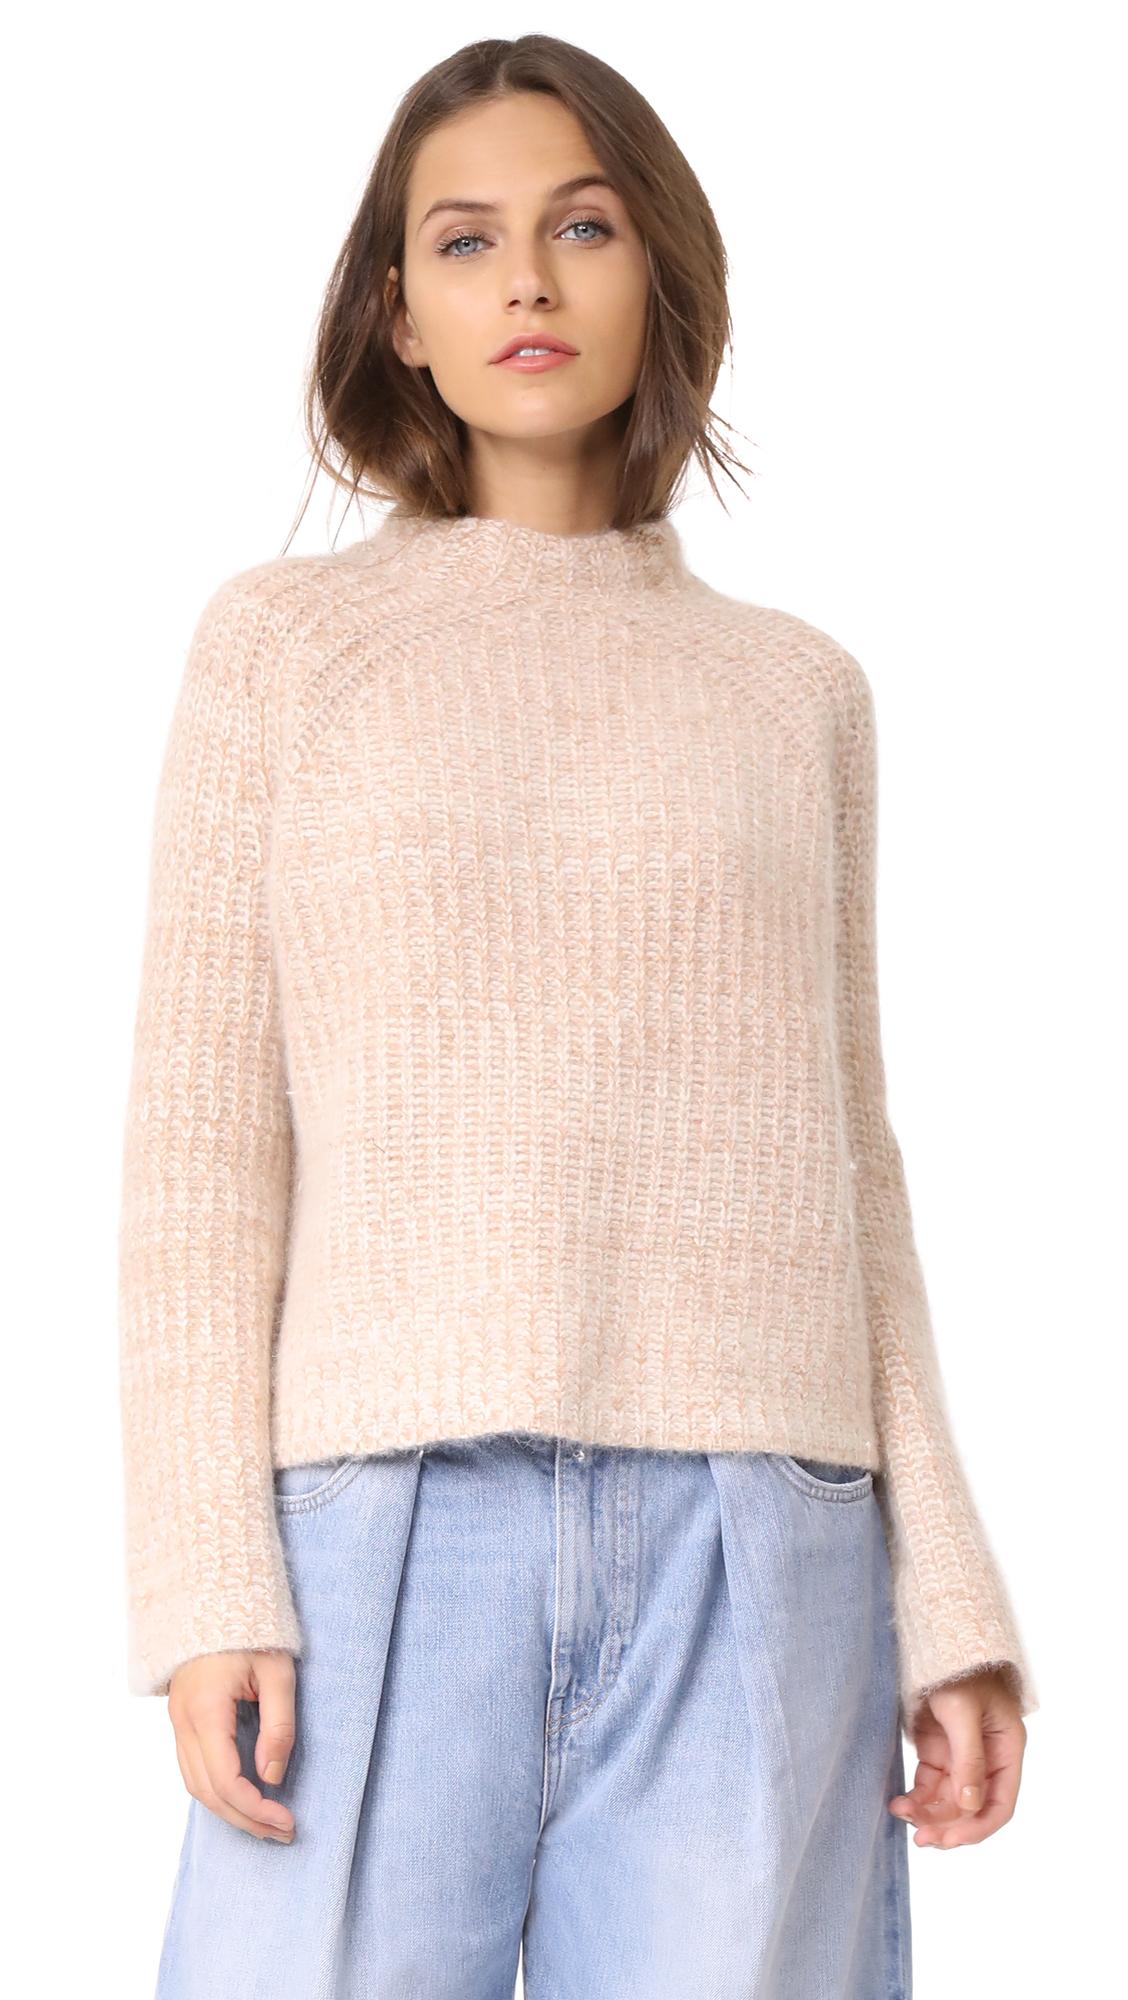 DEMYLEE Harris Sweater - Camel/White